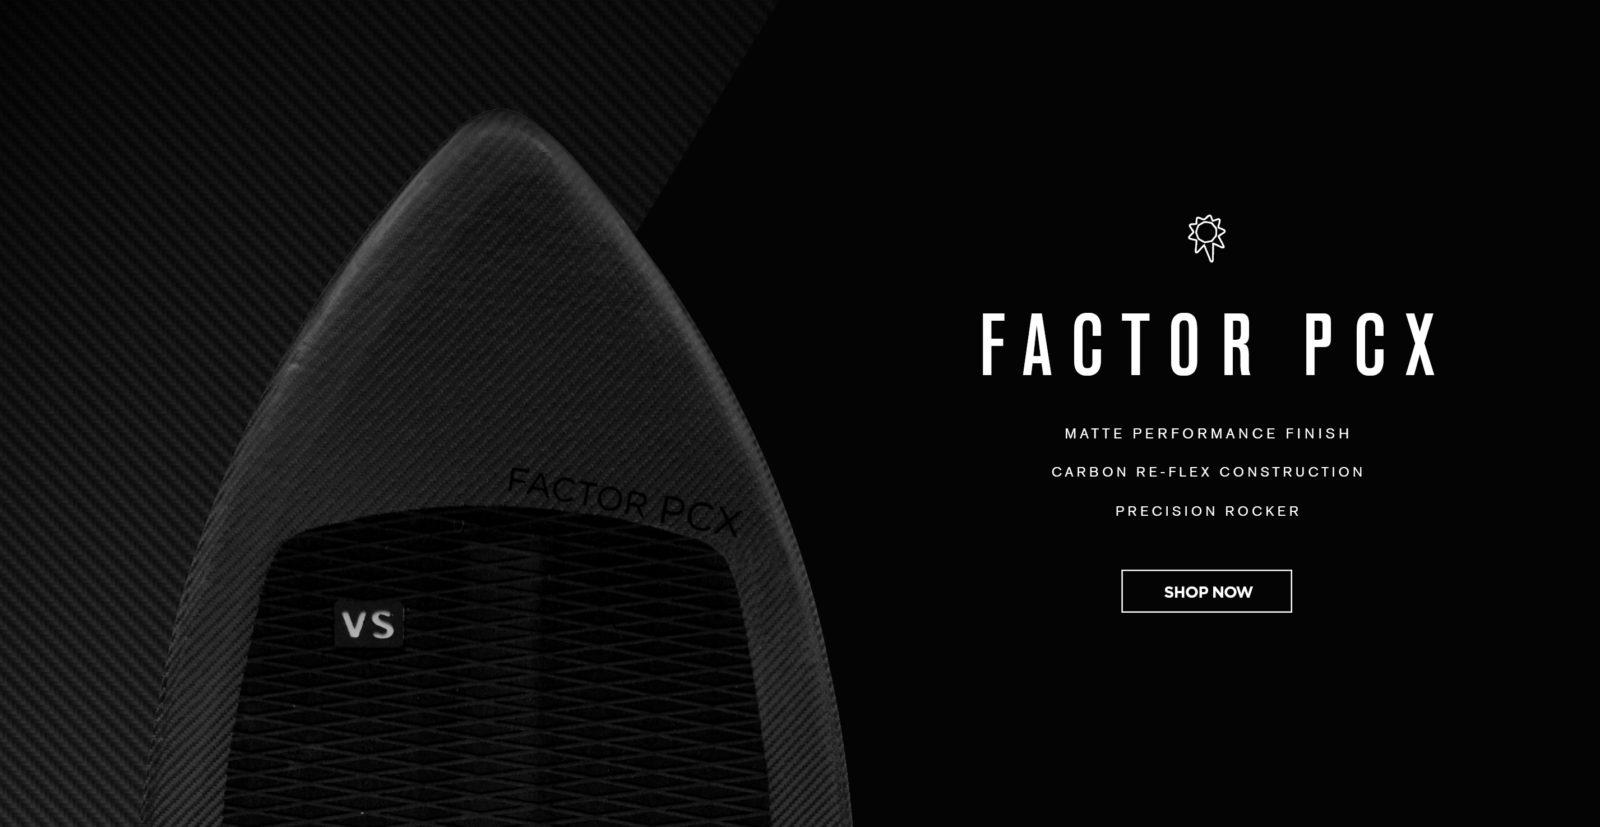 Factor_PCX_1664x850